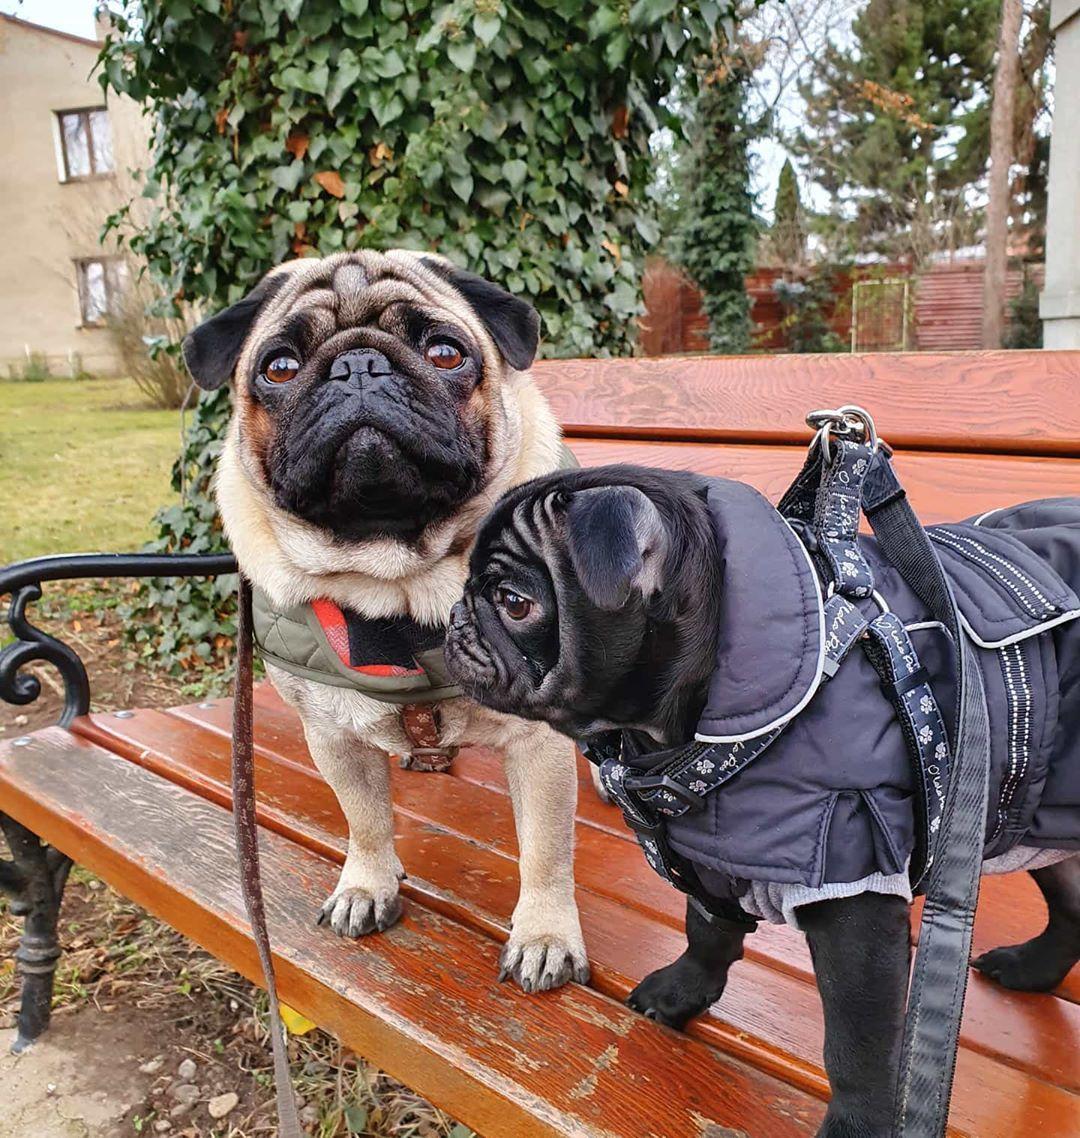 Zdravime Z Prochazky Pug Pugs Pugoftheday Mypug